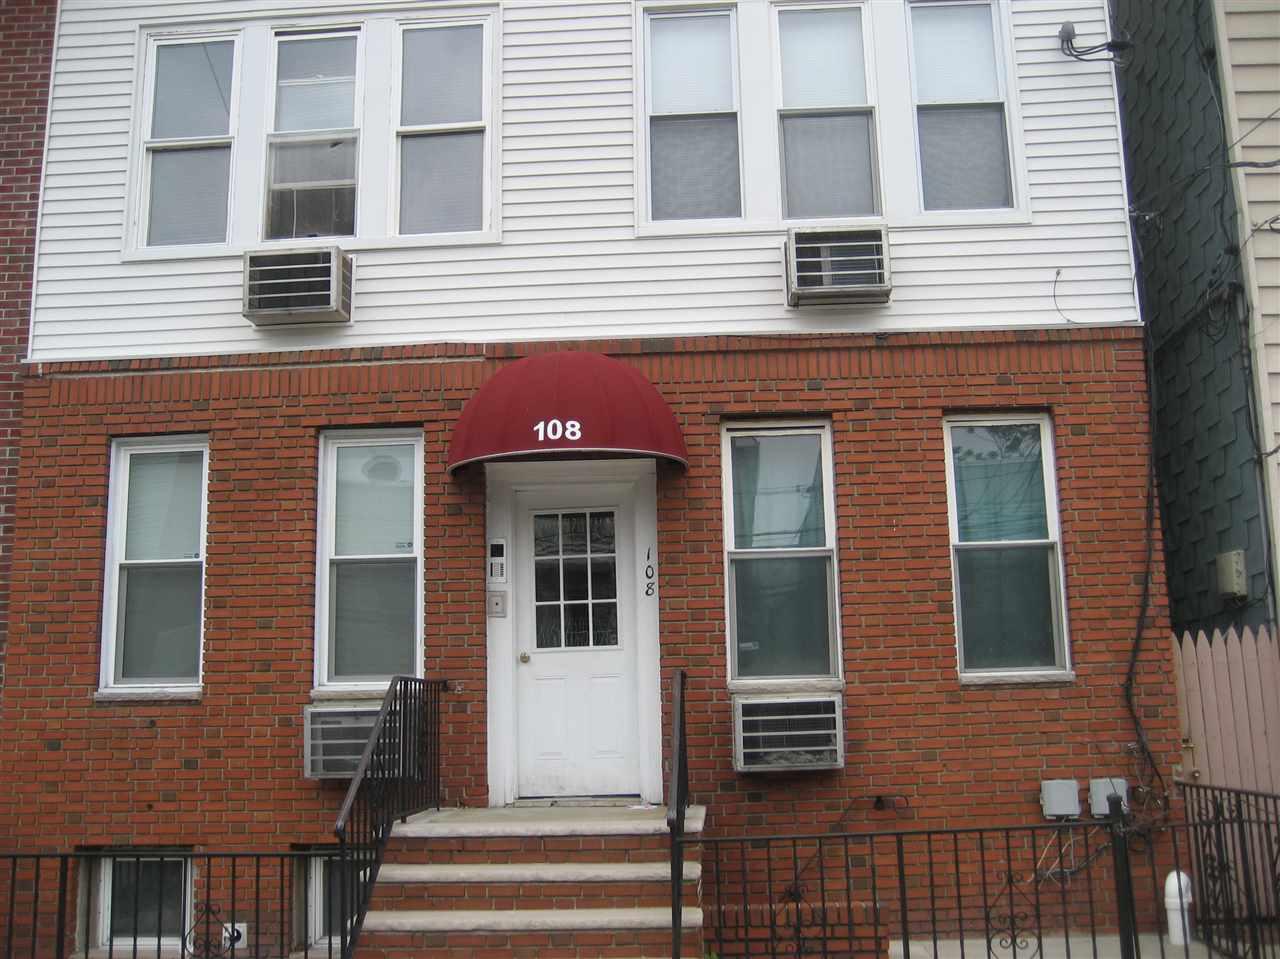 108 THORNE ST 2L, JC, Heights, NJ 07307